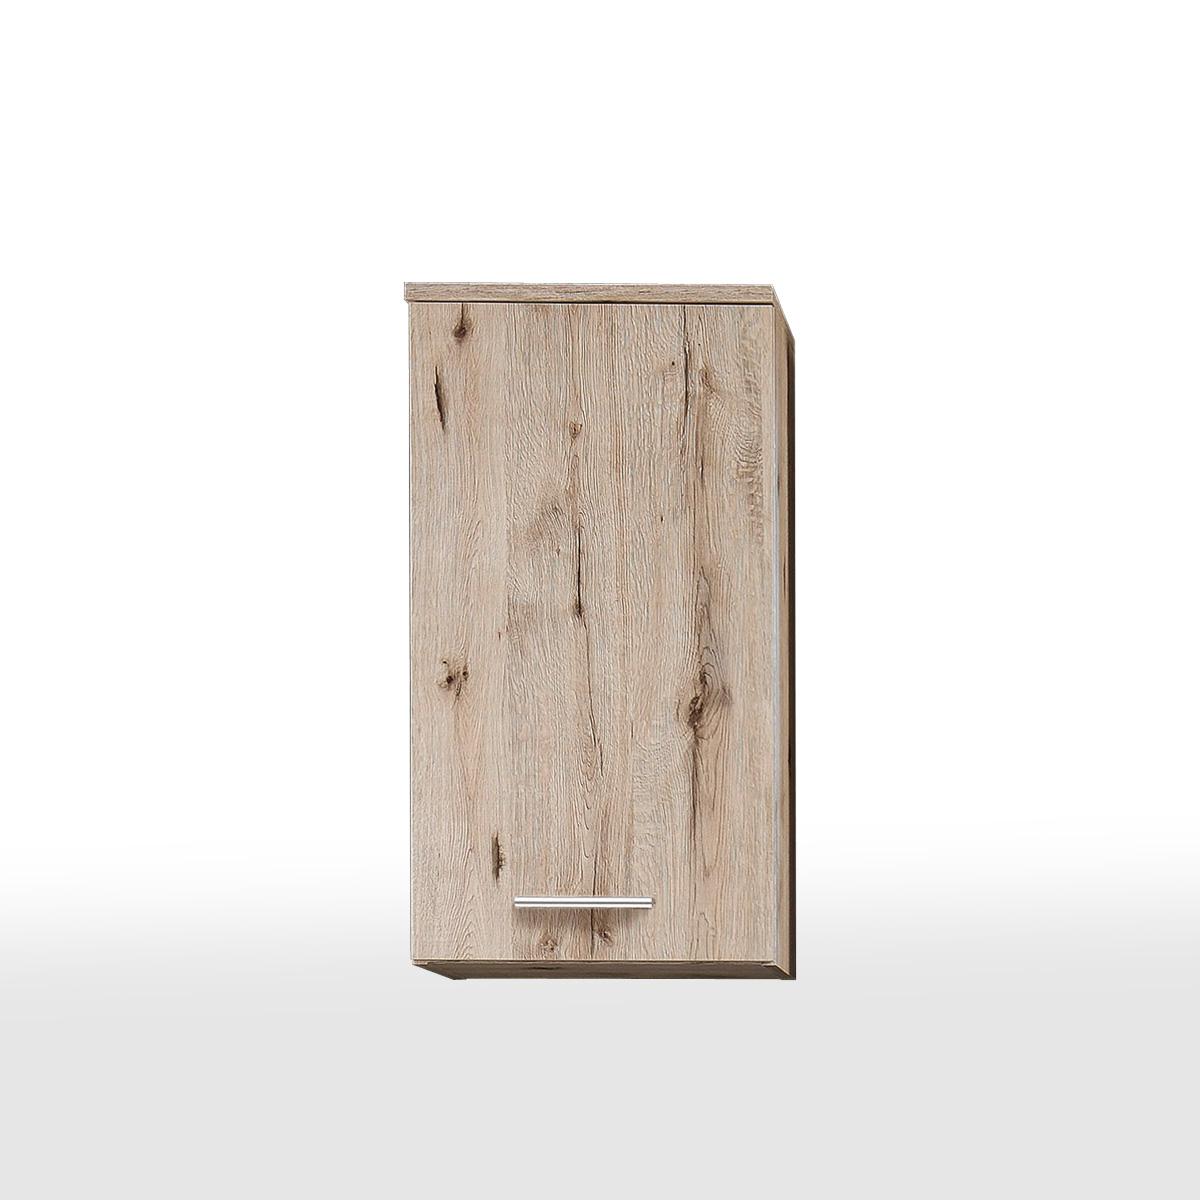 h ngeschrank lucas badezimmerschrank badschrank badm bel sandeiche ebay. Black Bedroom Furniture Sets. Home Design Ideas